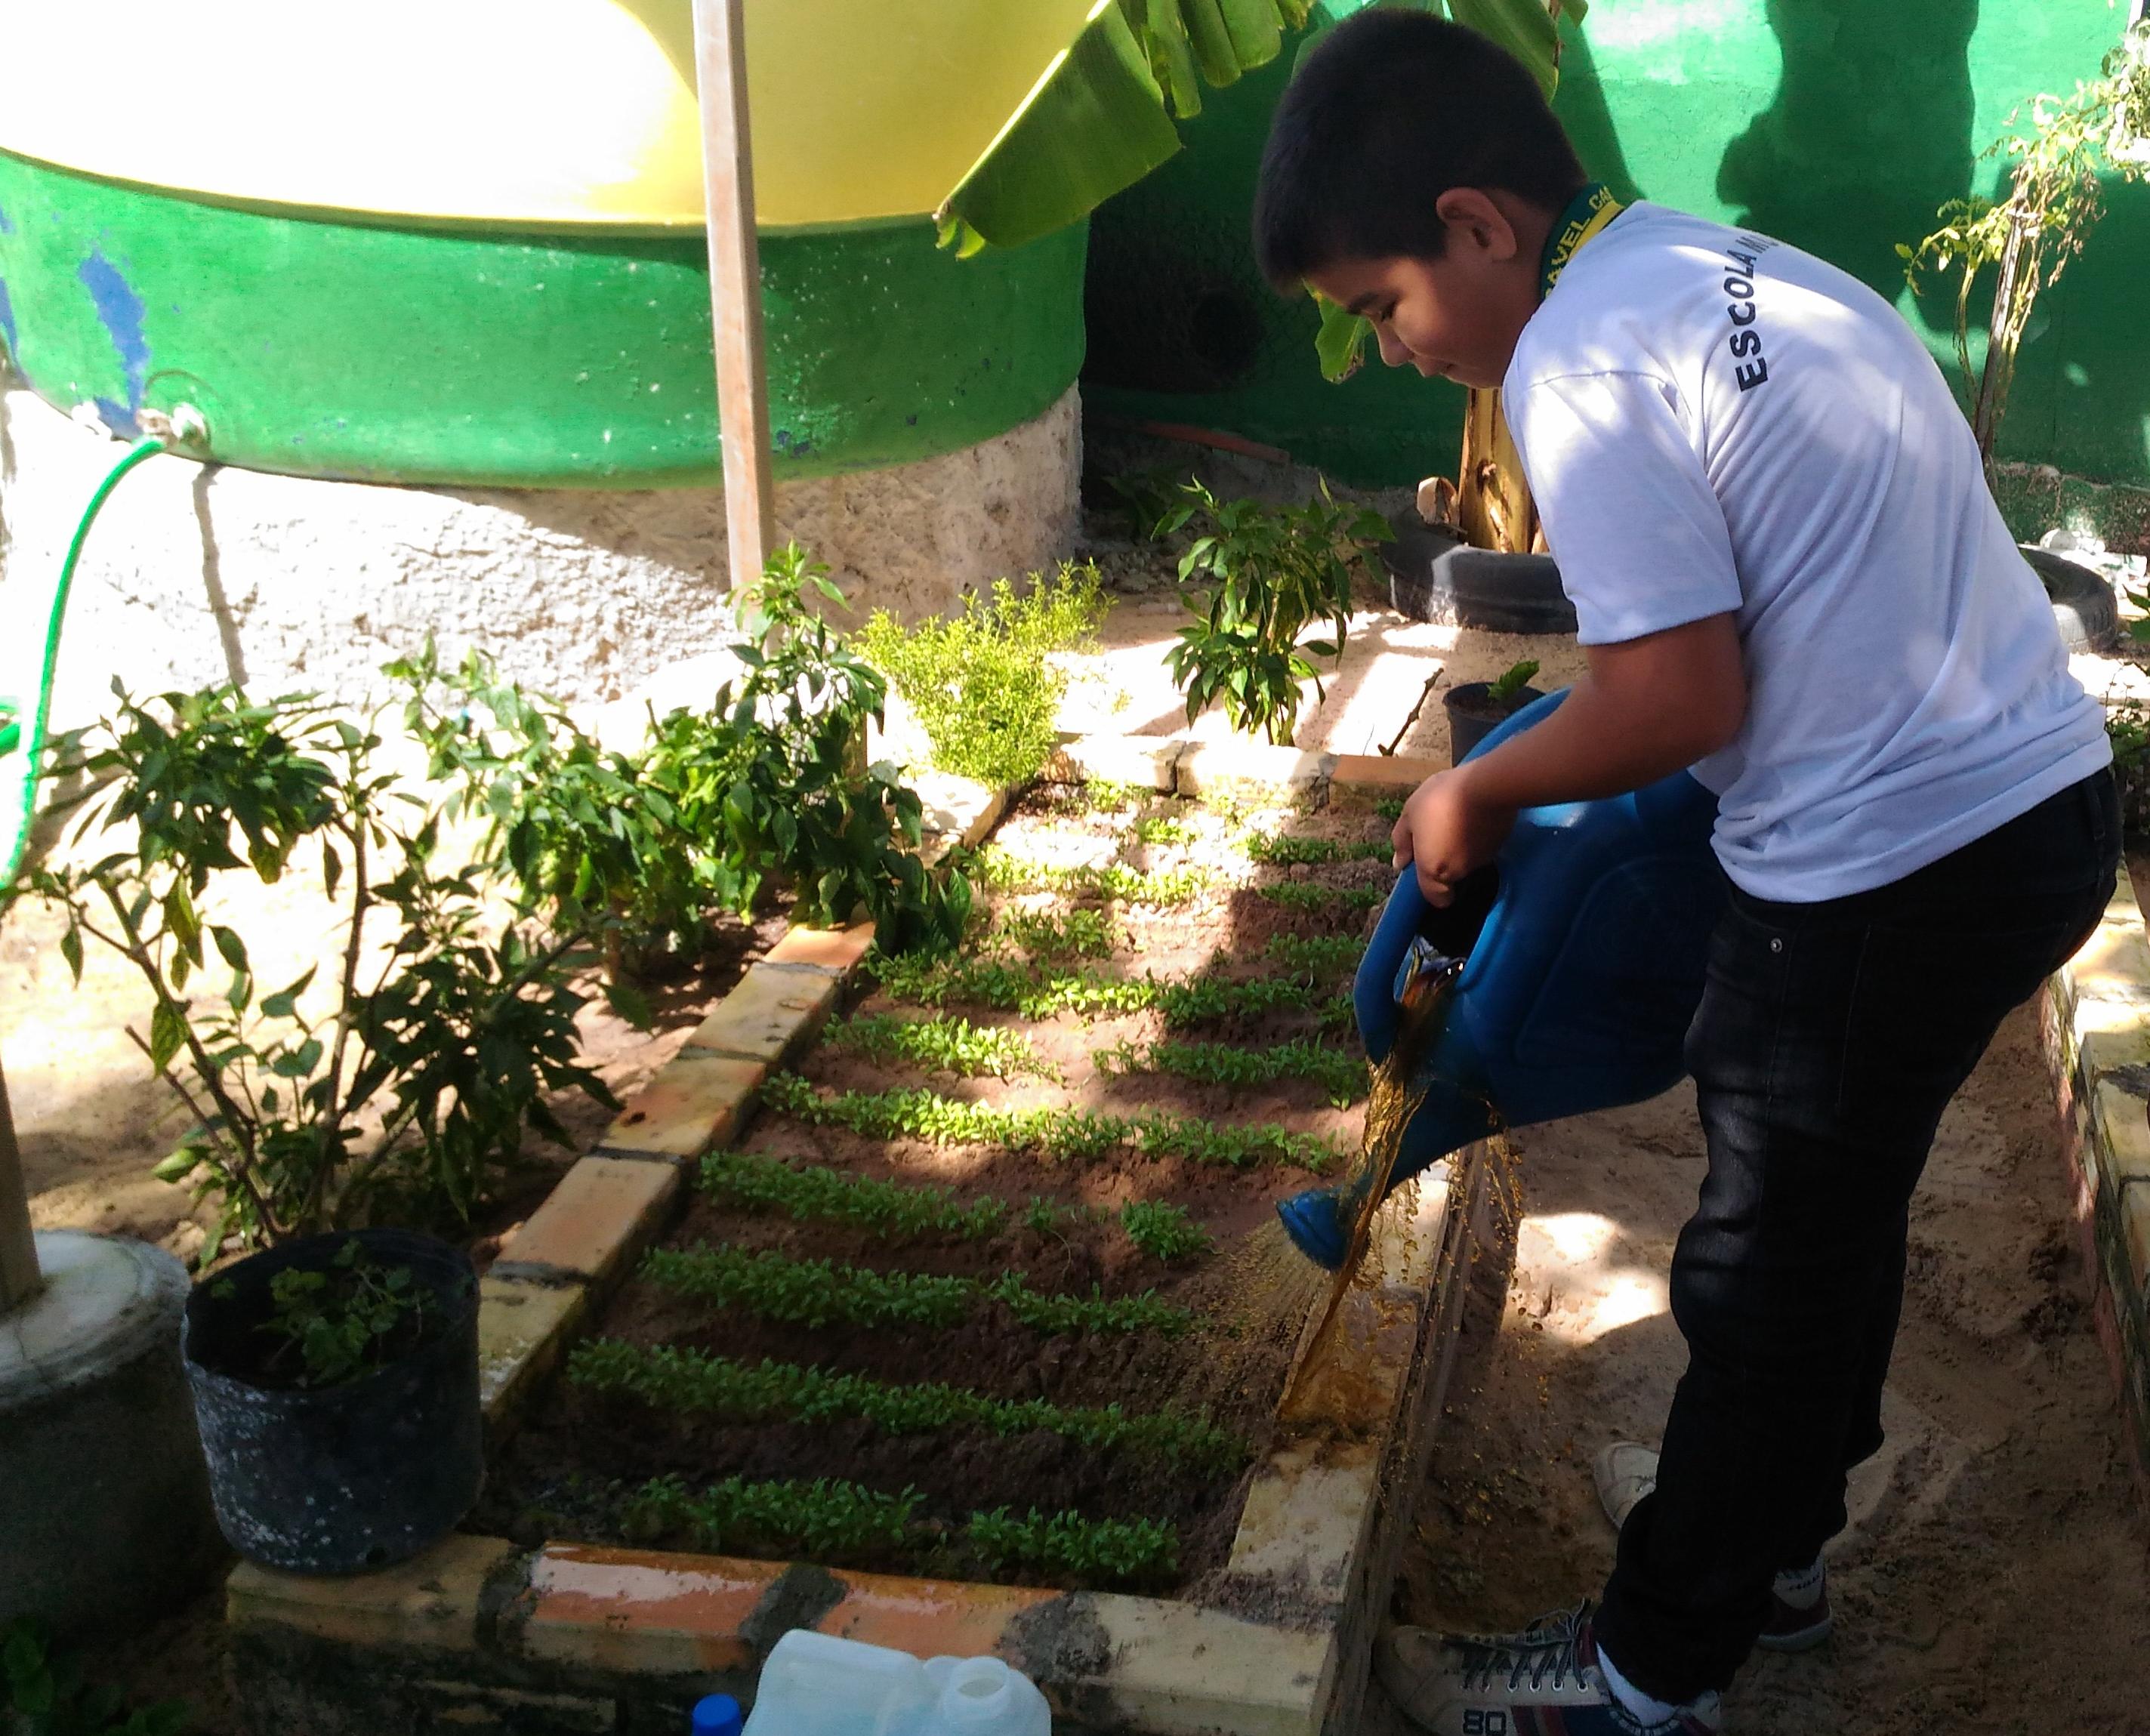 Projeto Biofertilizante líquido natural, finalista no Desafio Criativos da Escola 2019